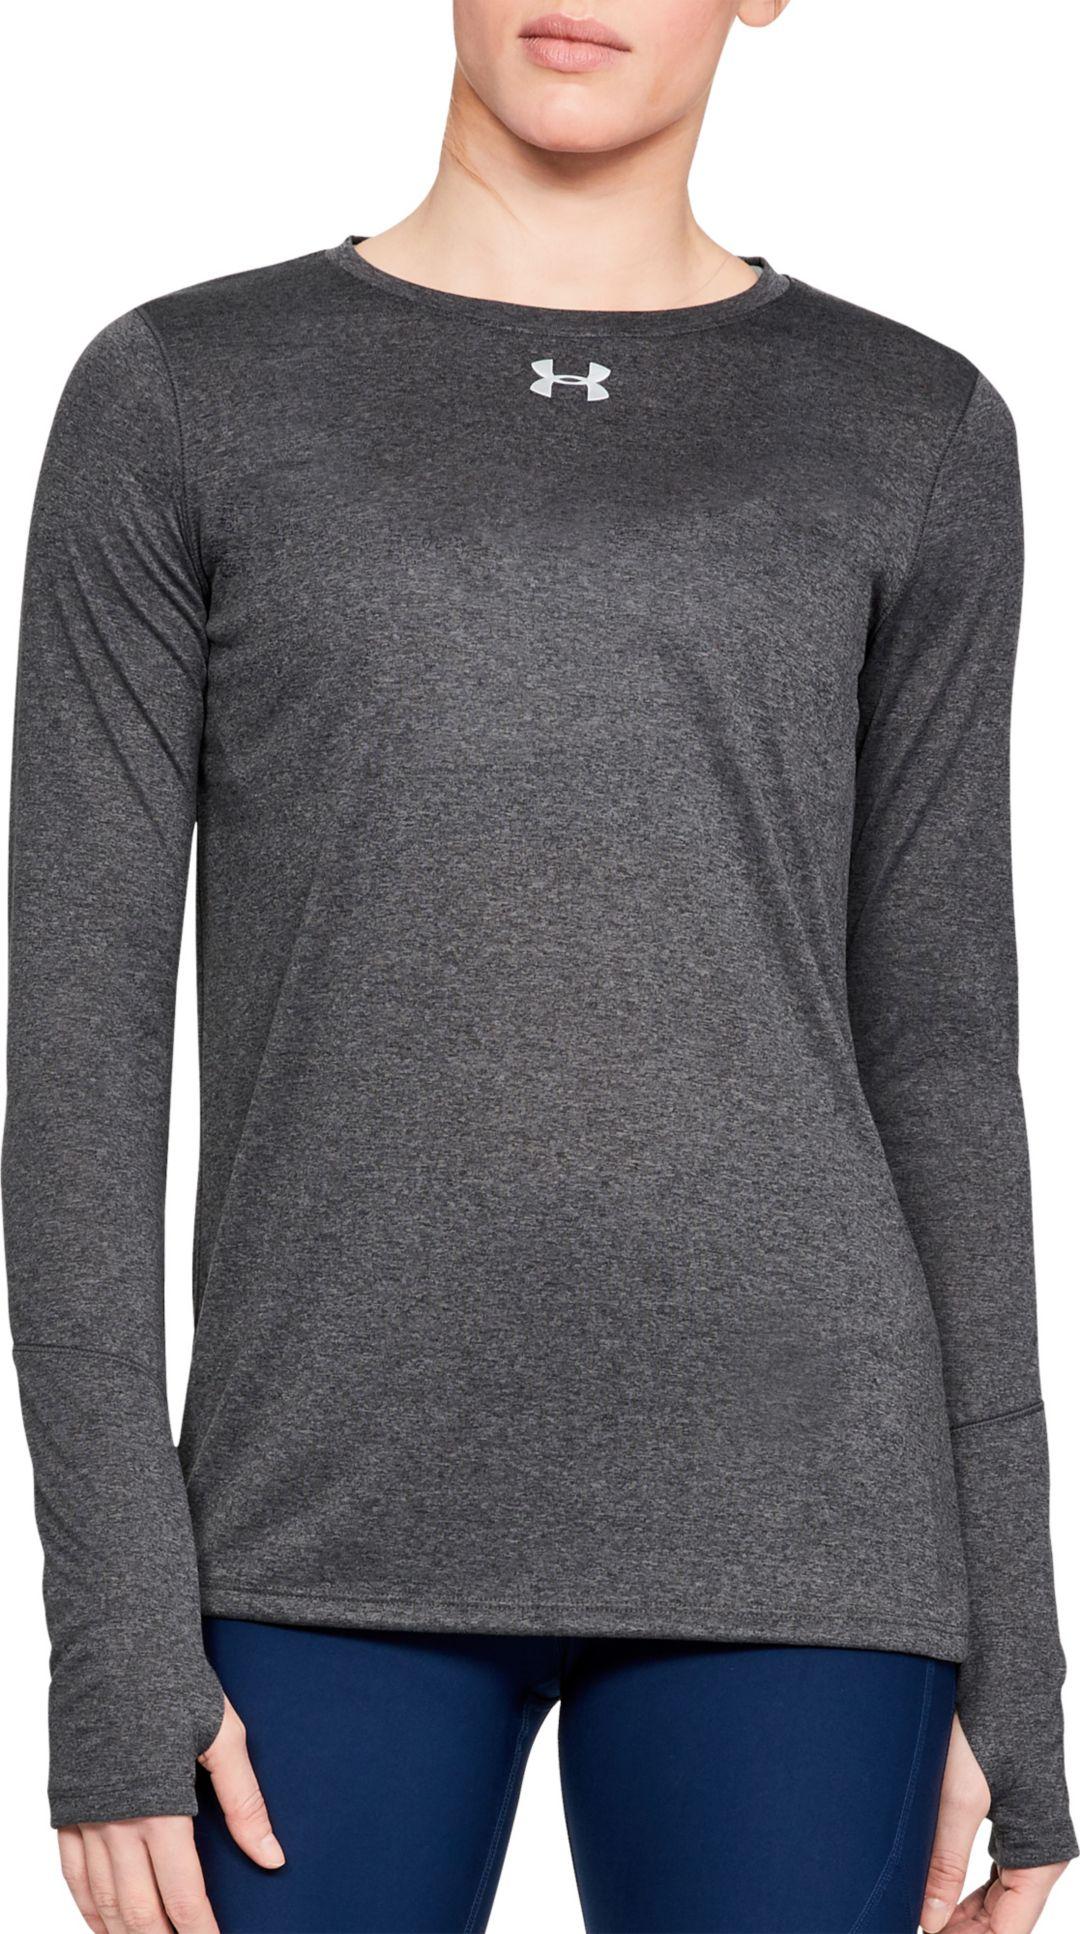 77f793027e551f Under Armour Women's Locker 2.0 Long Sleeve Shirt   DICK'S Sporting ...